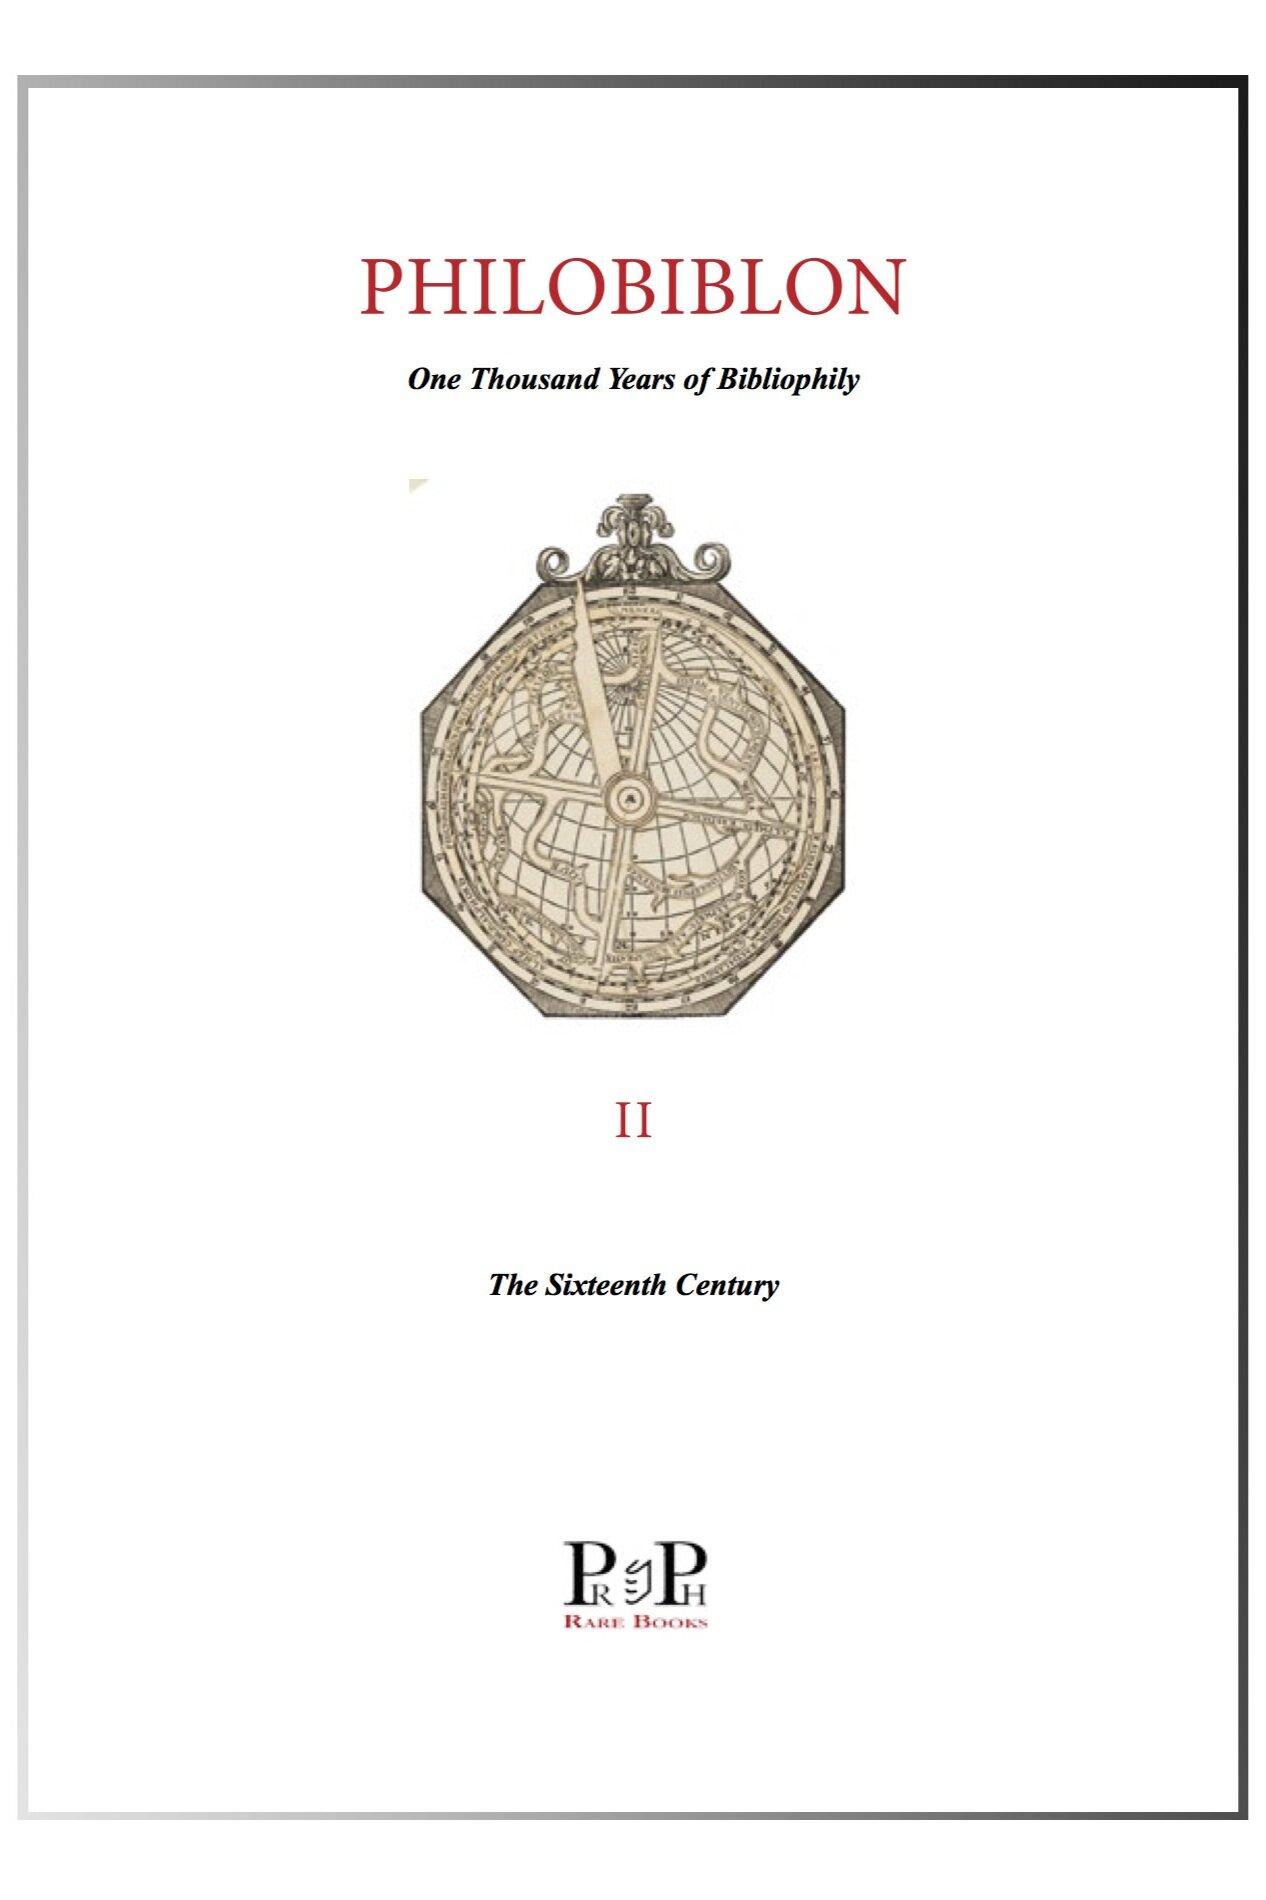 Philobiblon Vol 2 - cover (1).jpg